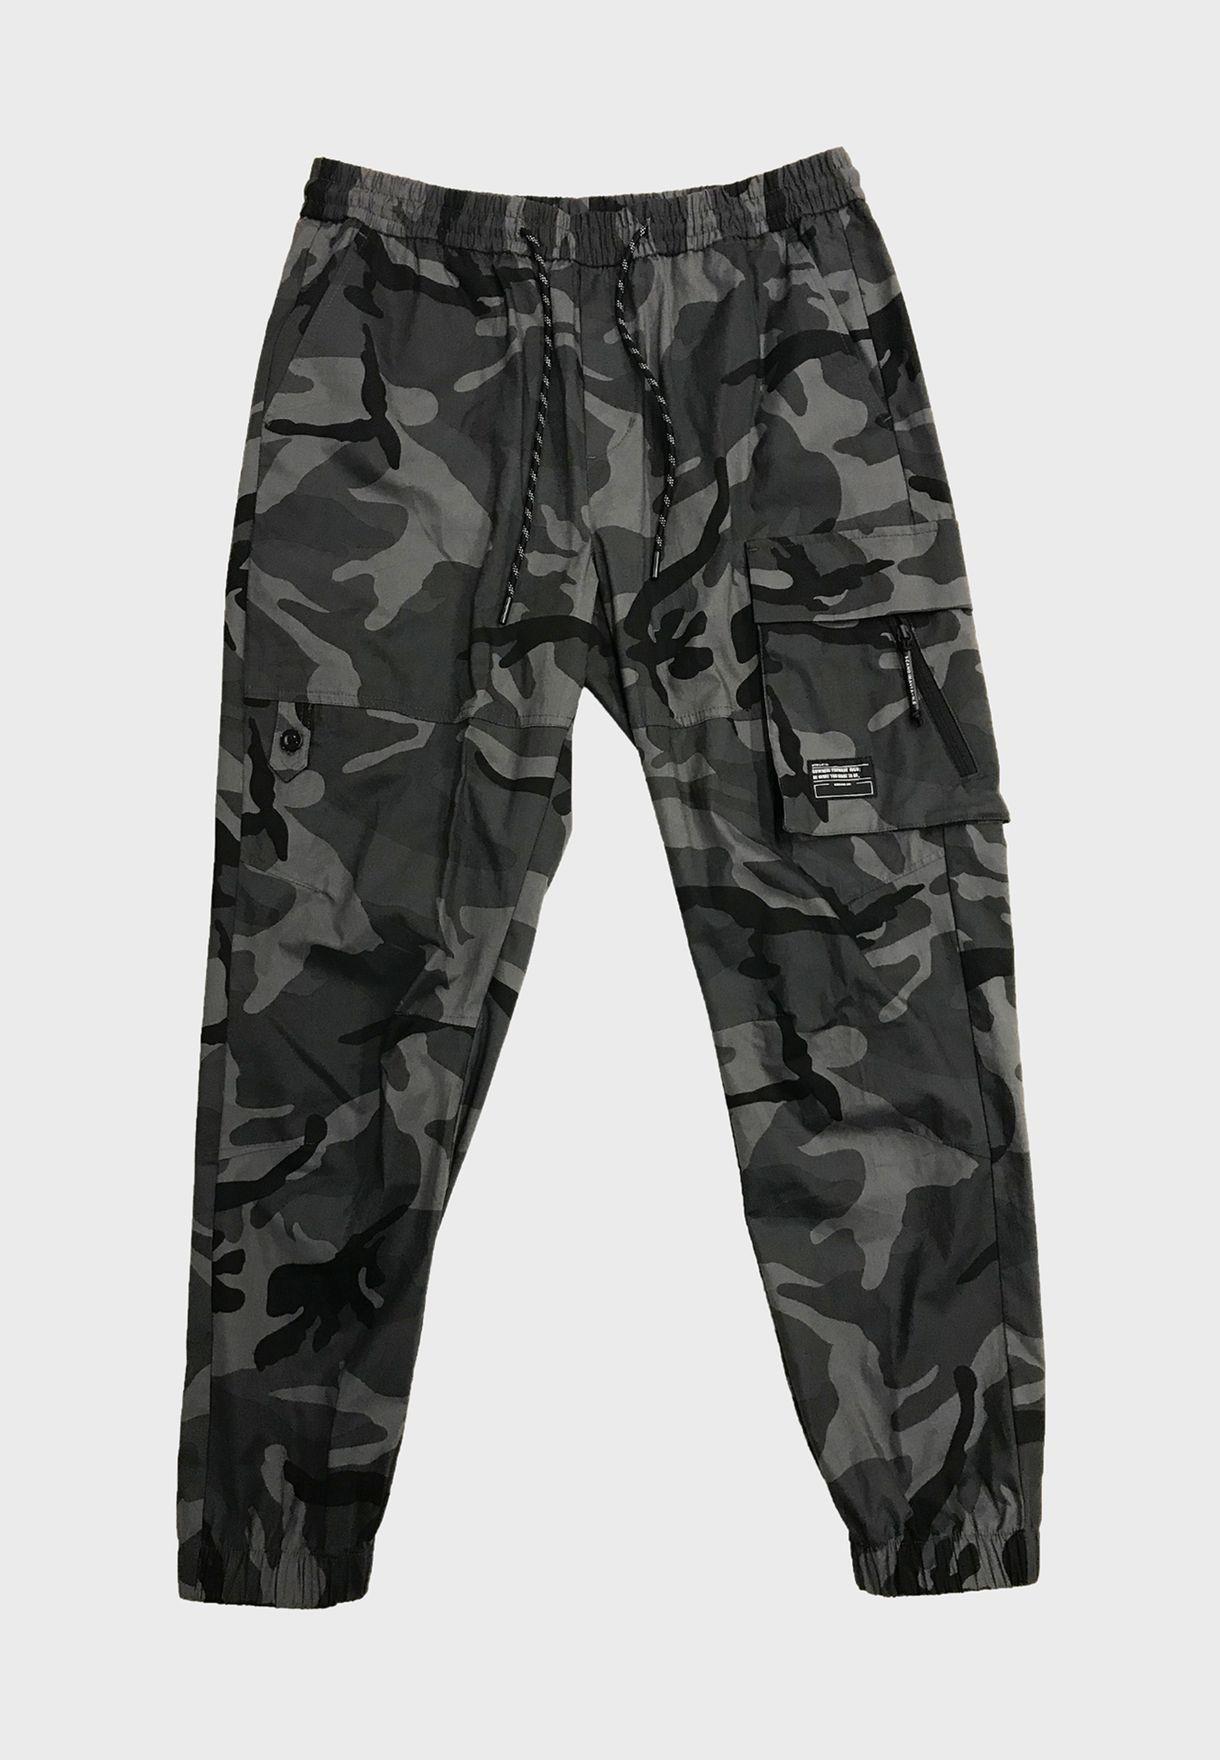 Camo Cuffed Cargo Pants